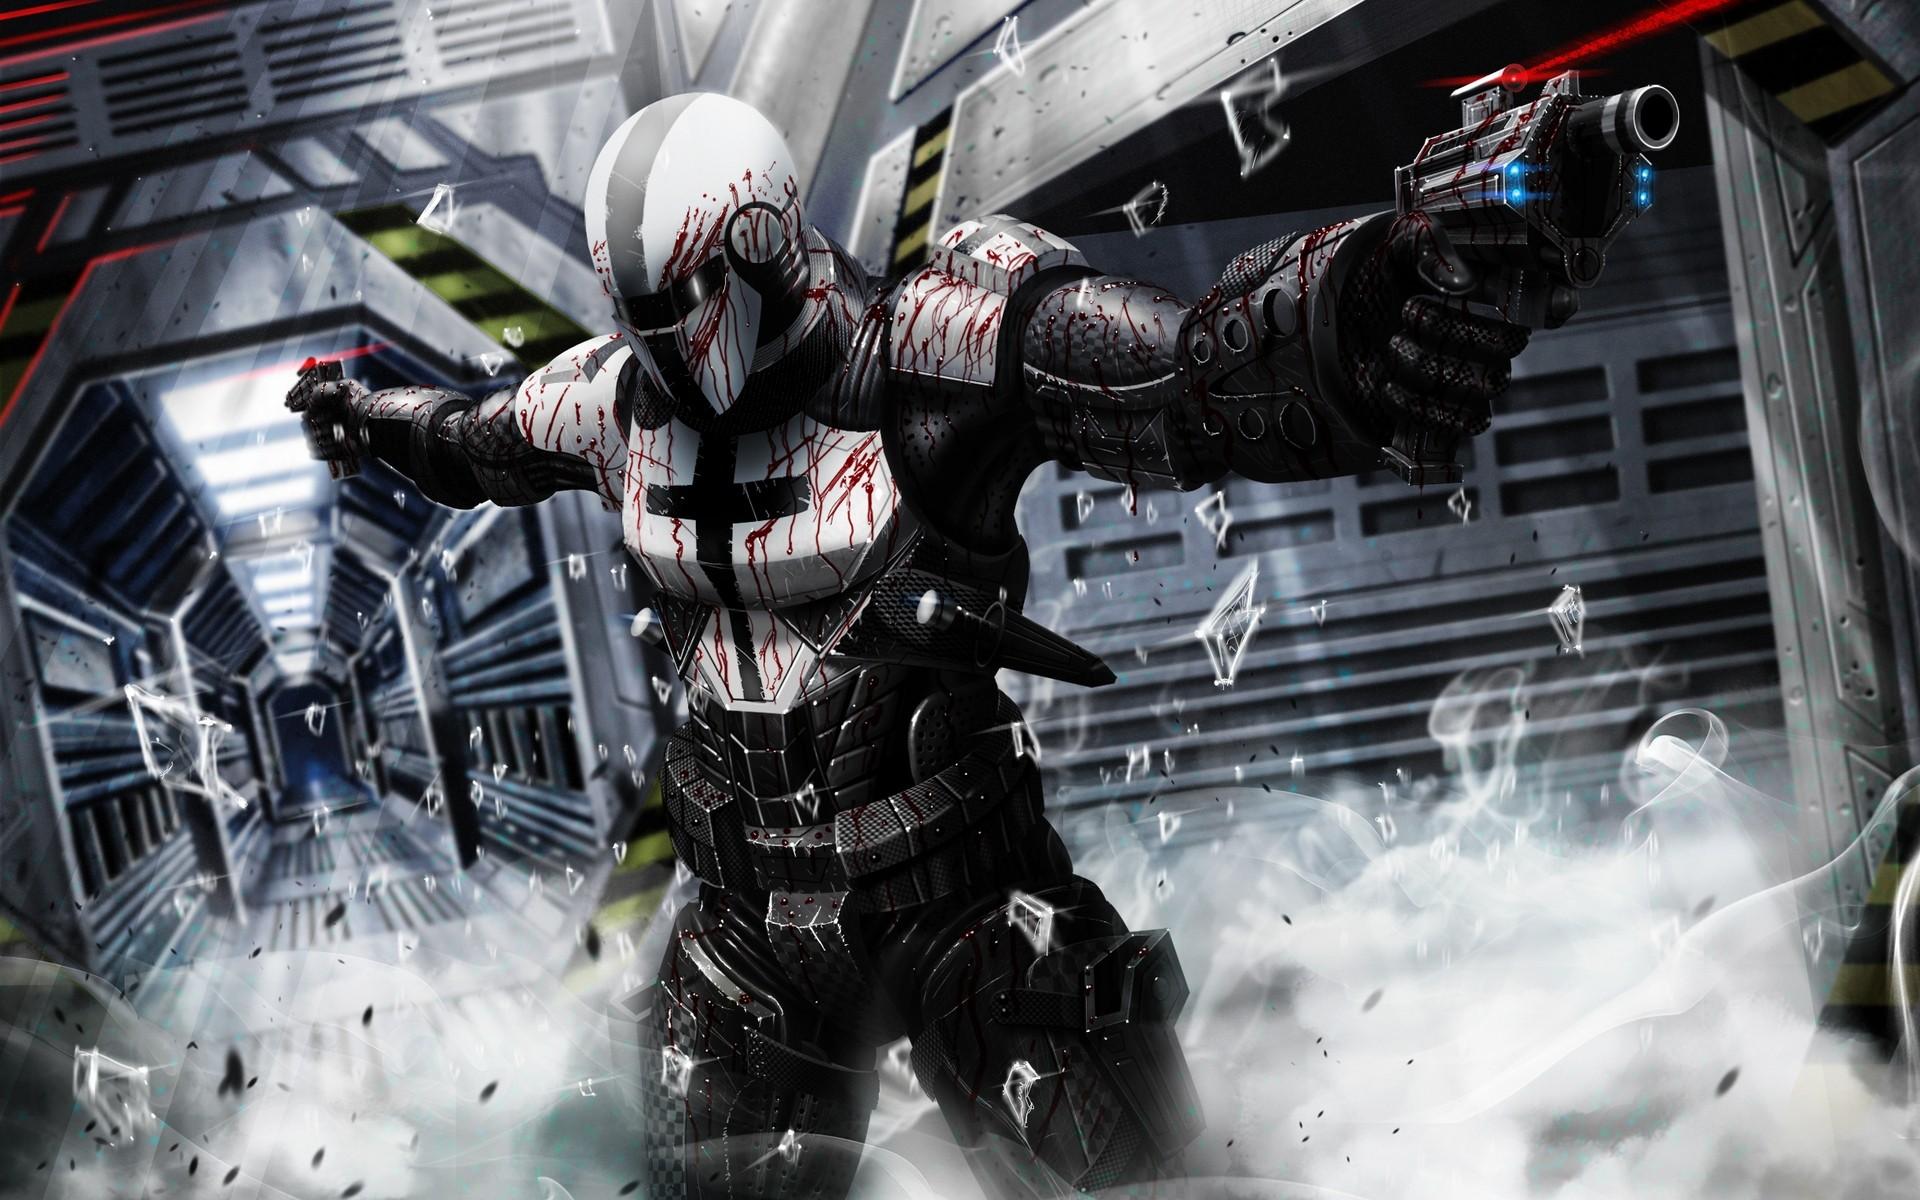 Armor Warrior Guild Wars 2 - Phone wallpapers